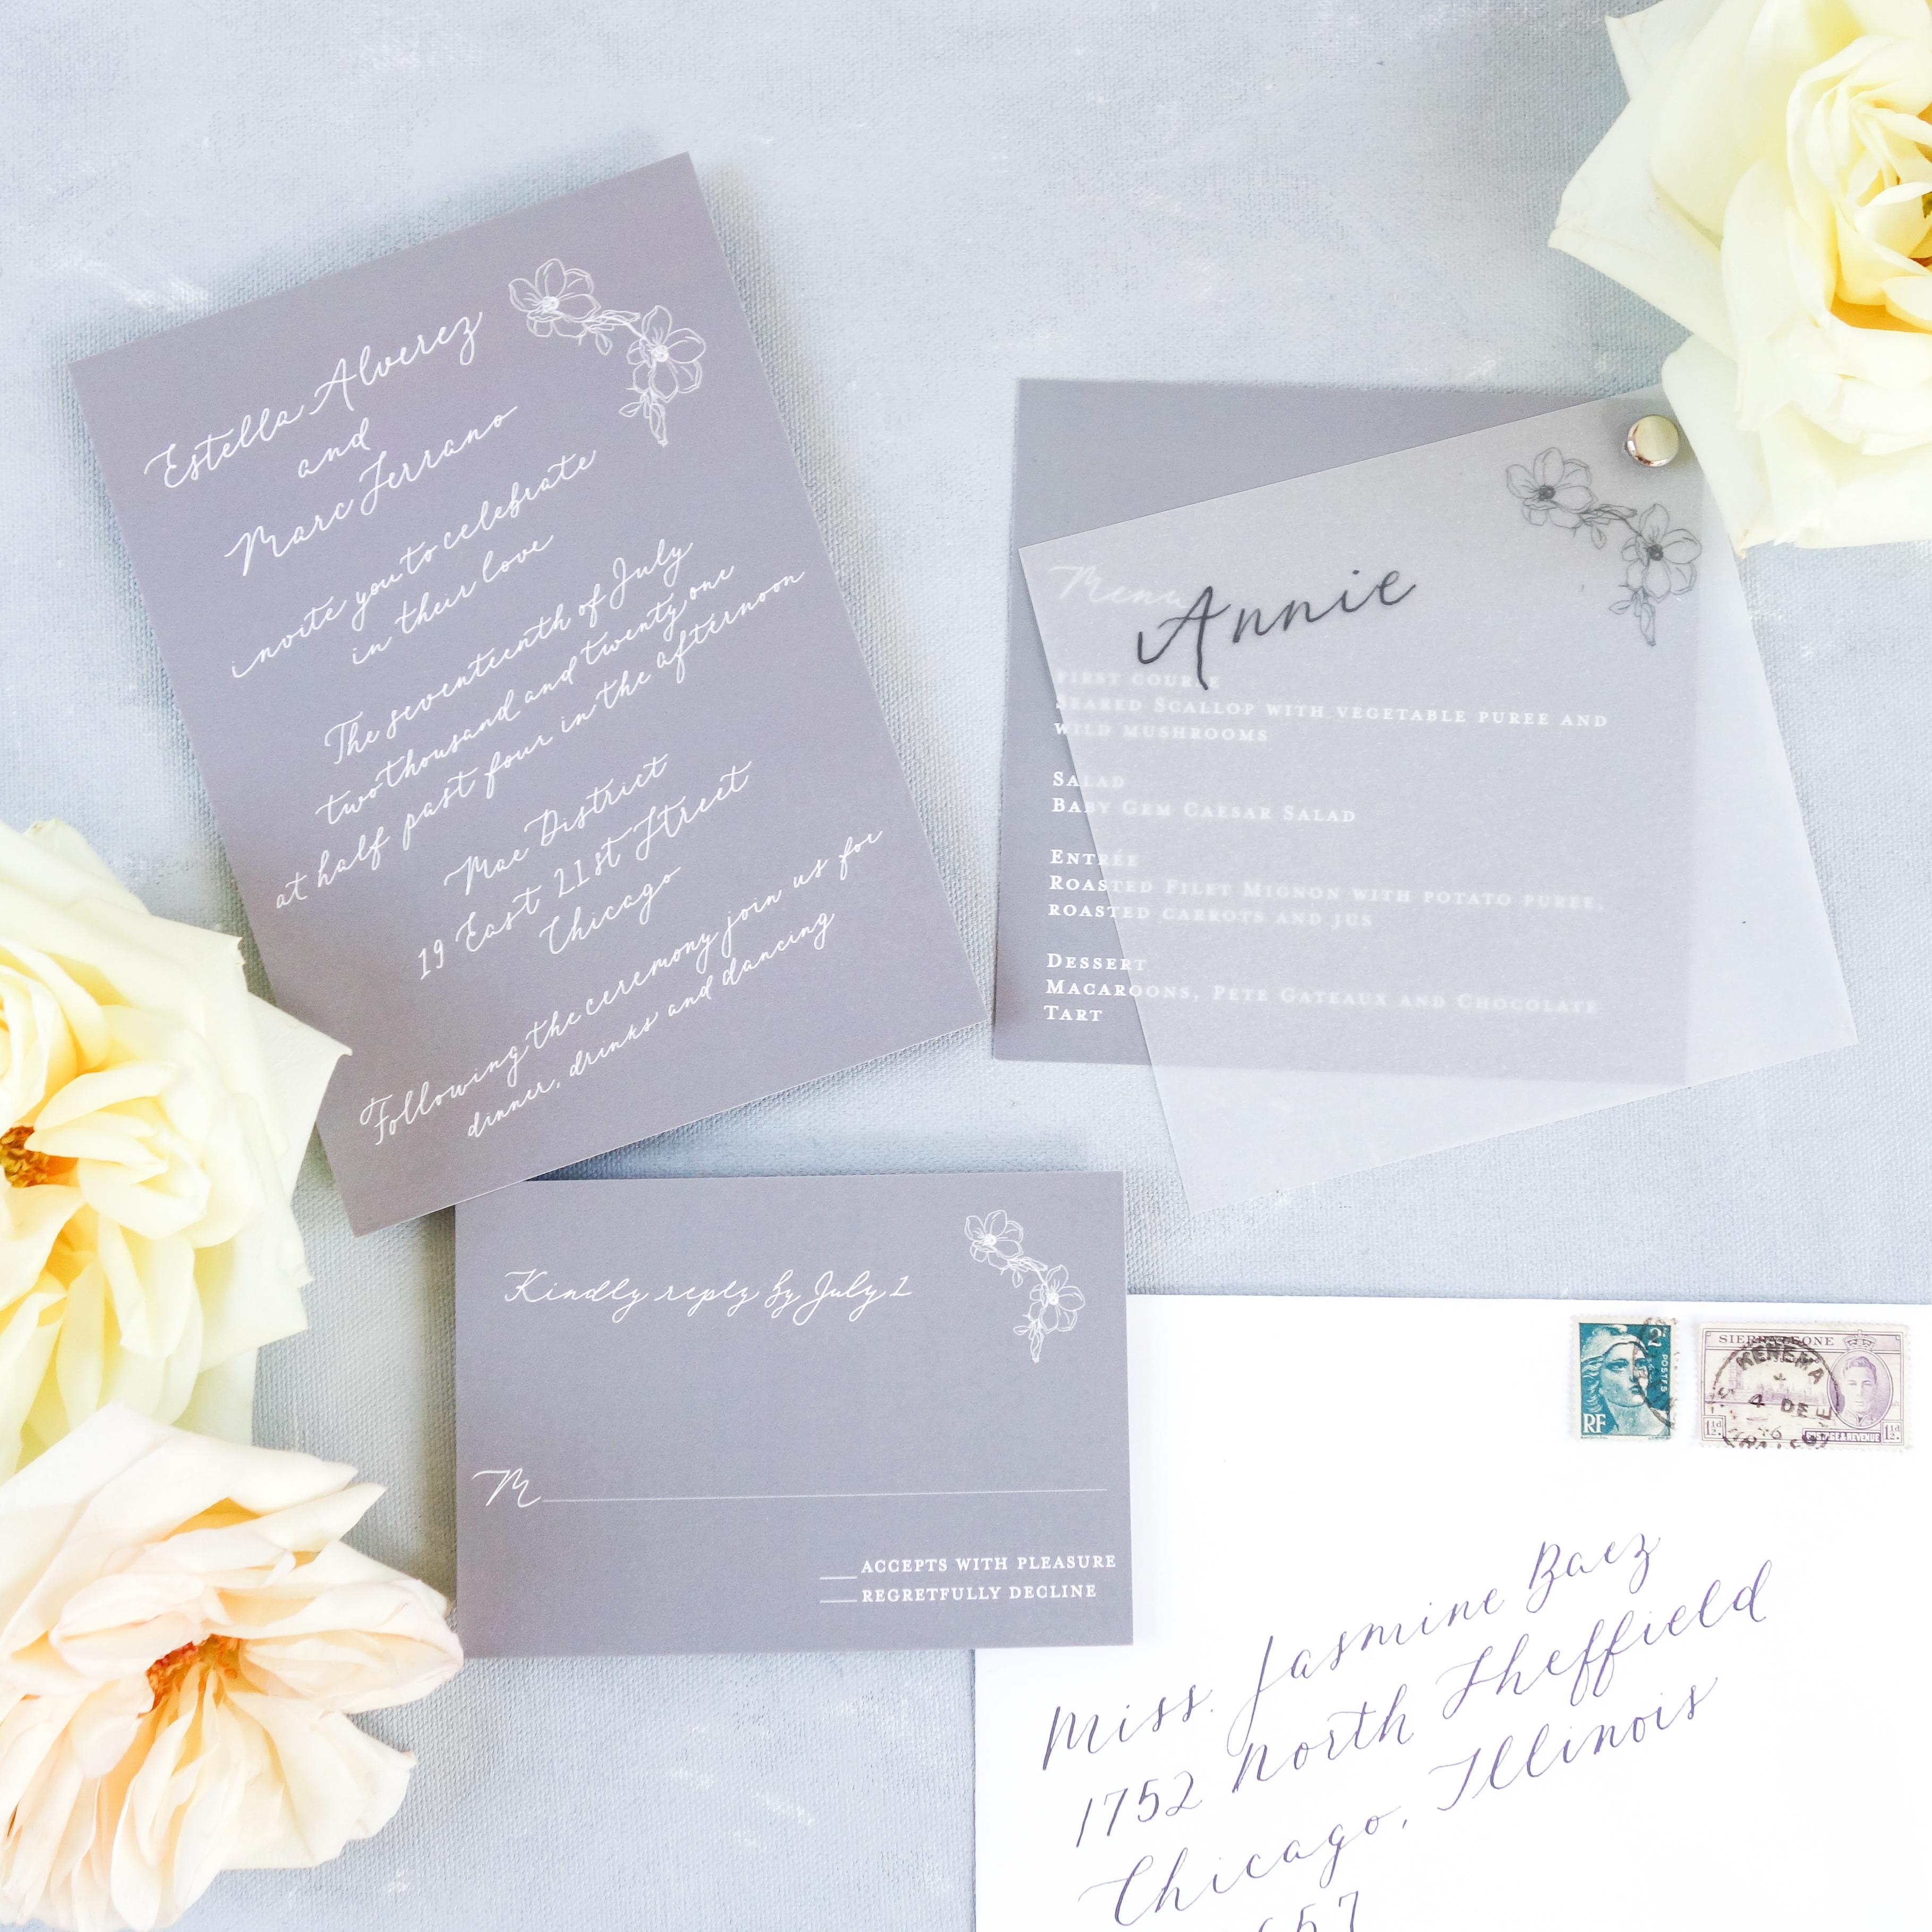 Chicago Calligrapher Chicago Wedding Invitations (5)